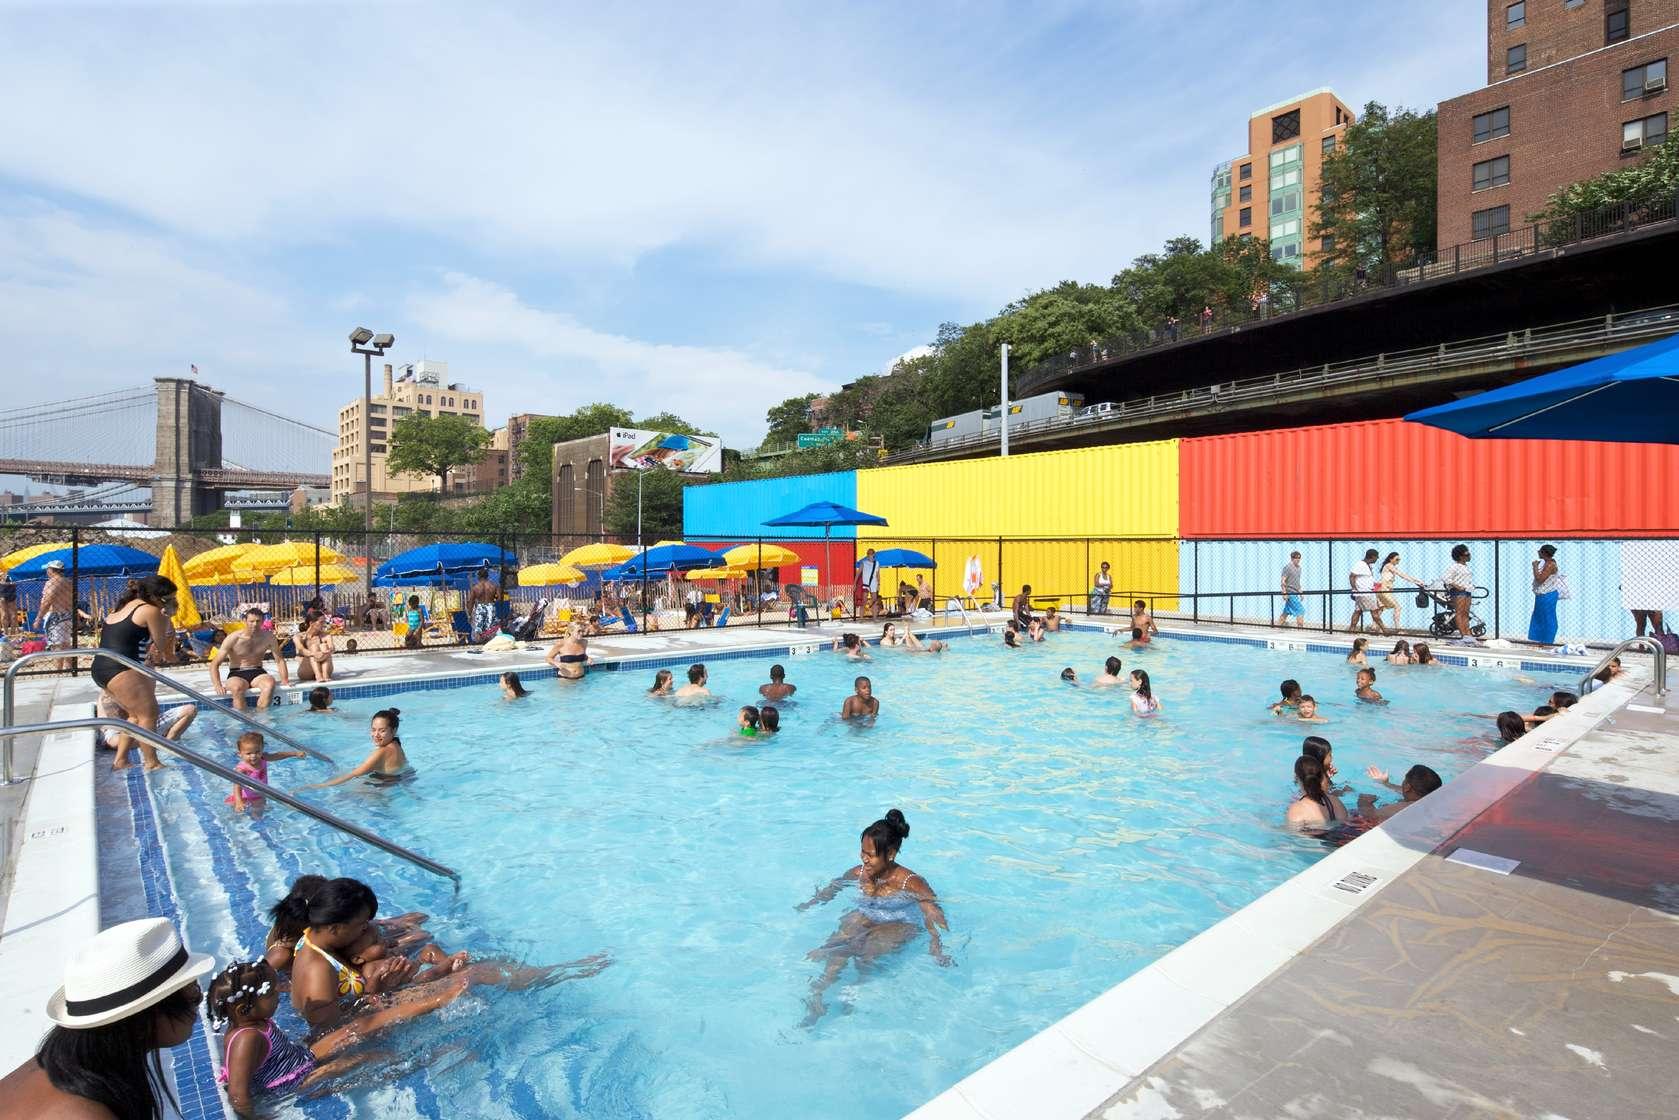 brooklyn bridge park pop up pool architizer. Black Bedroom Furniture Sets. Home Design Ideas